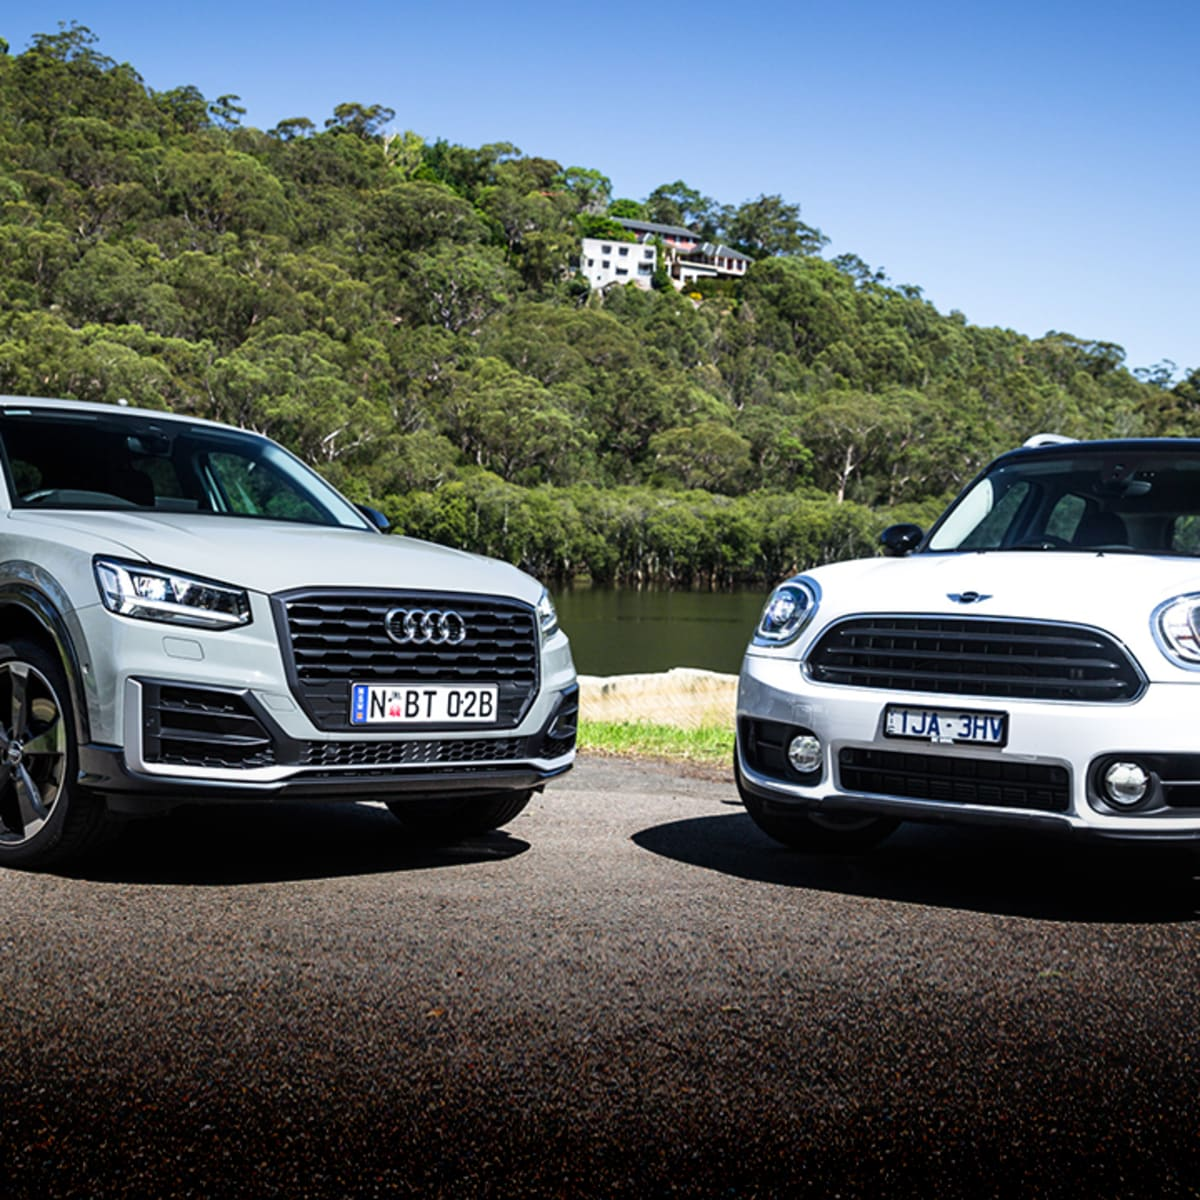 Audi Q2 1 4 TFSI v Mini Cooper Countryman comparison | CarAdvice